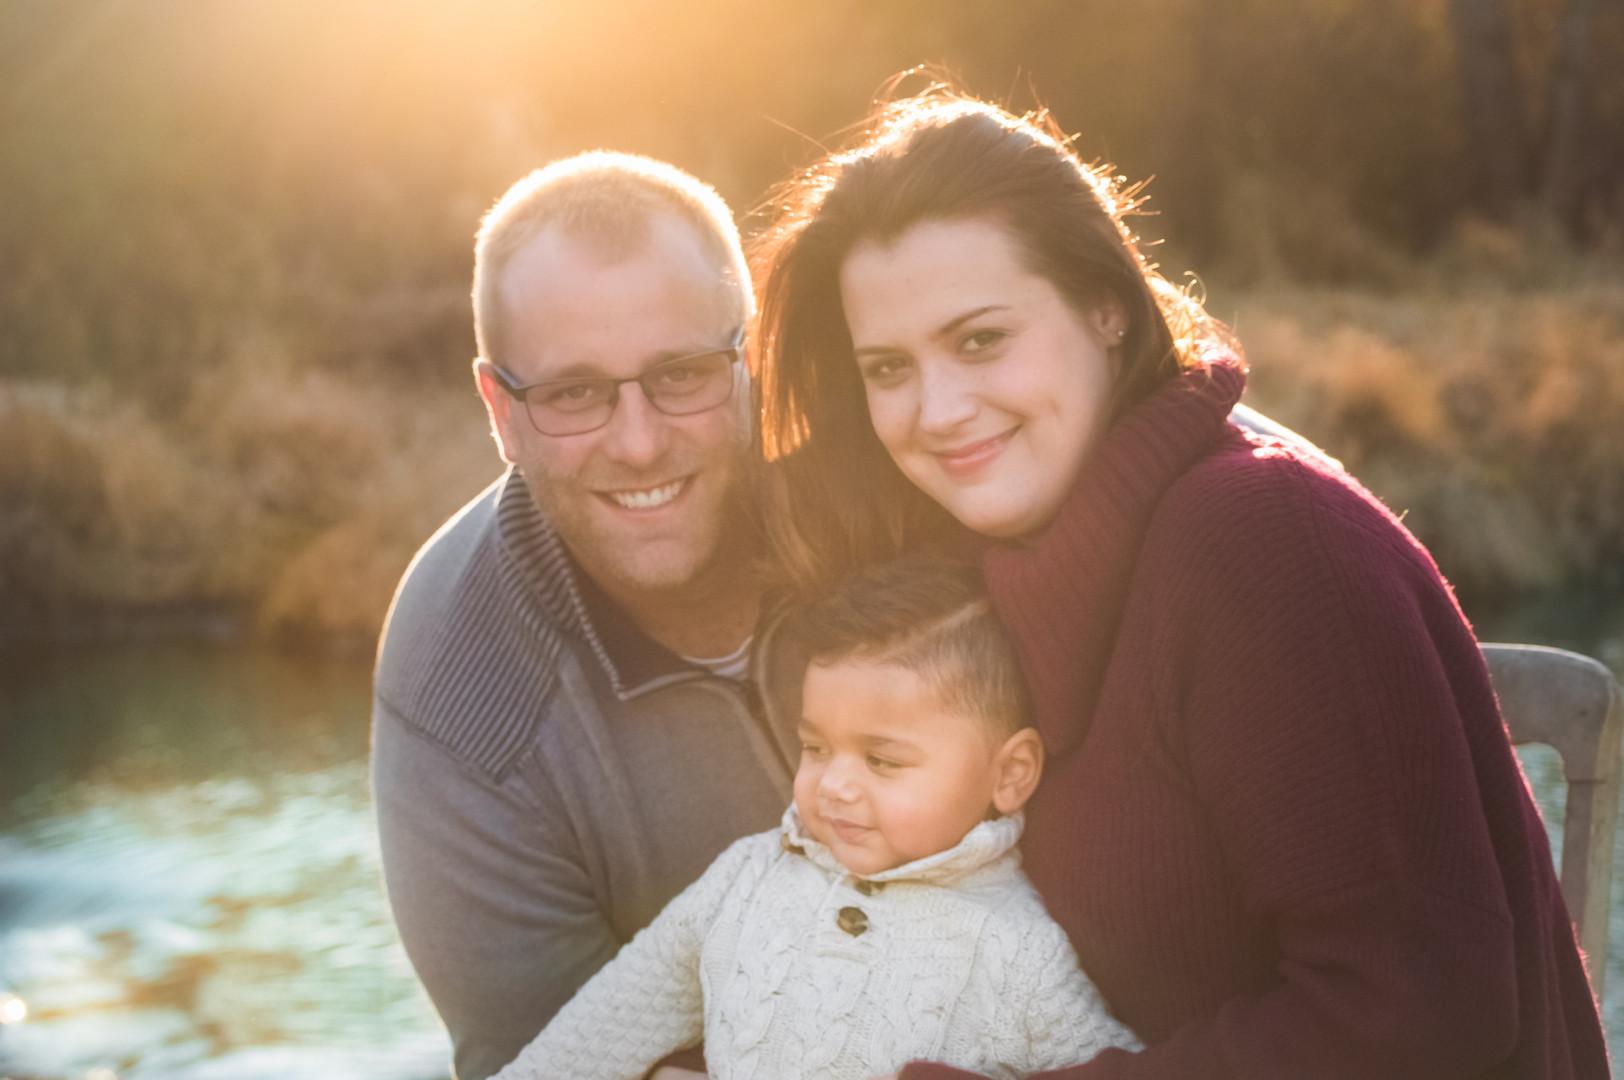 Family Portrait of 3